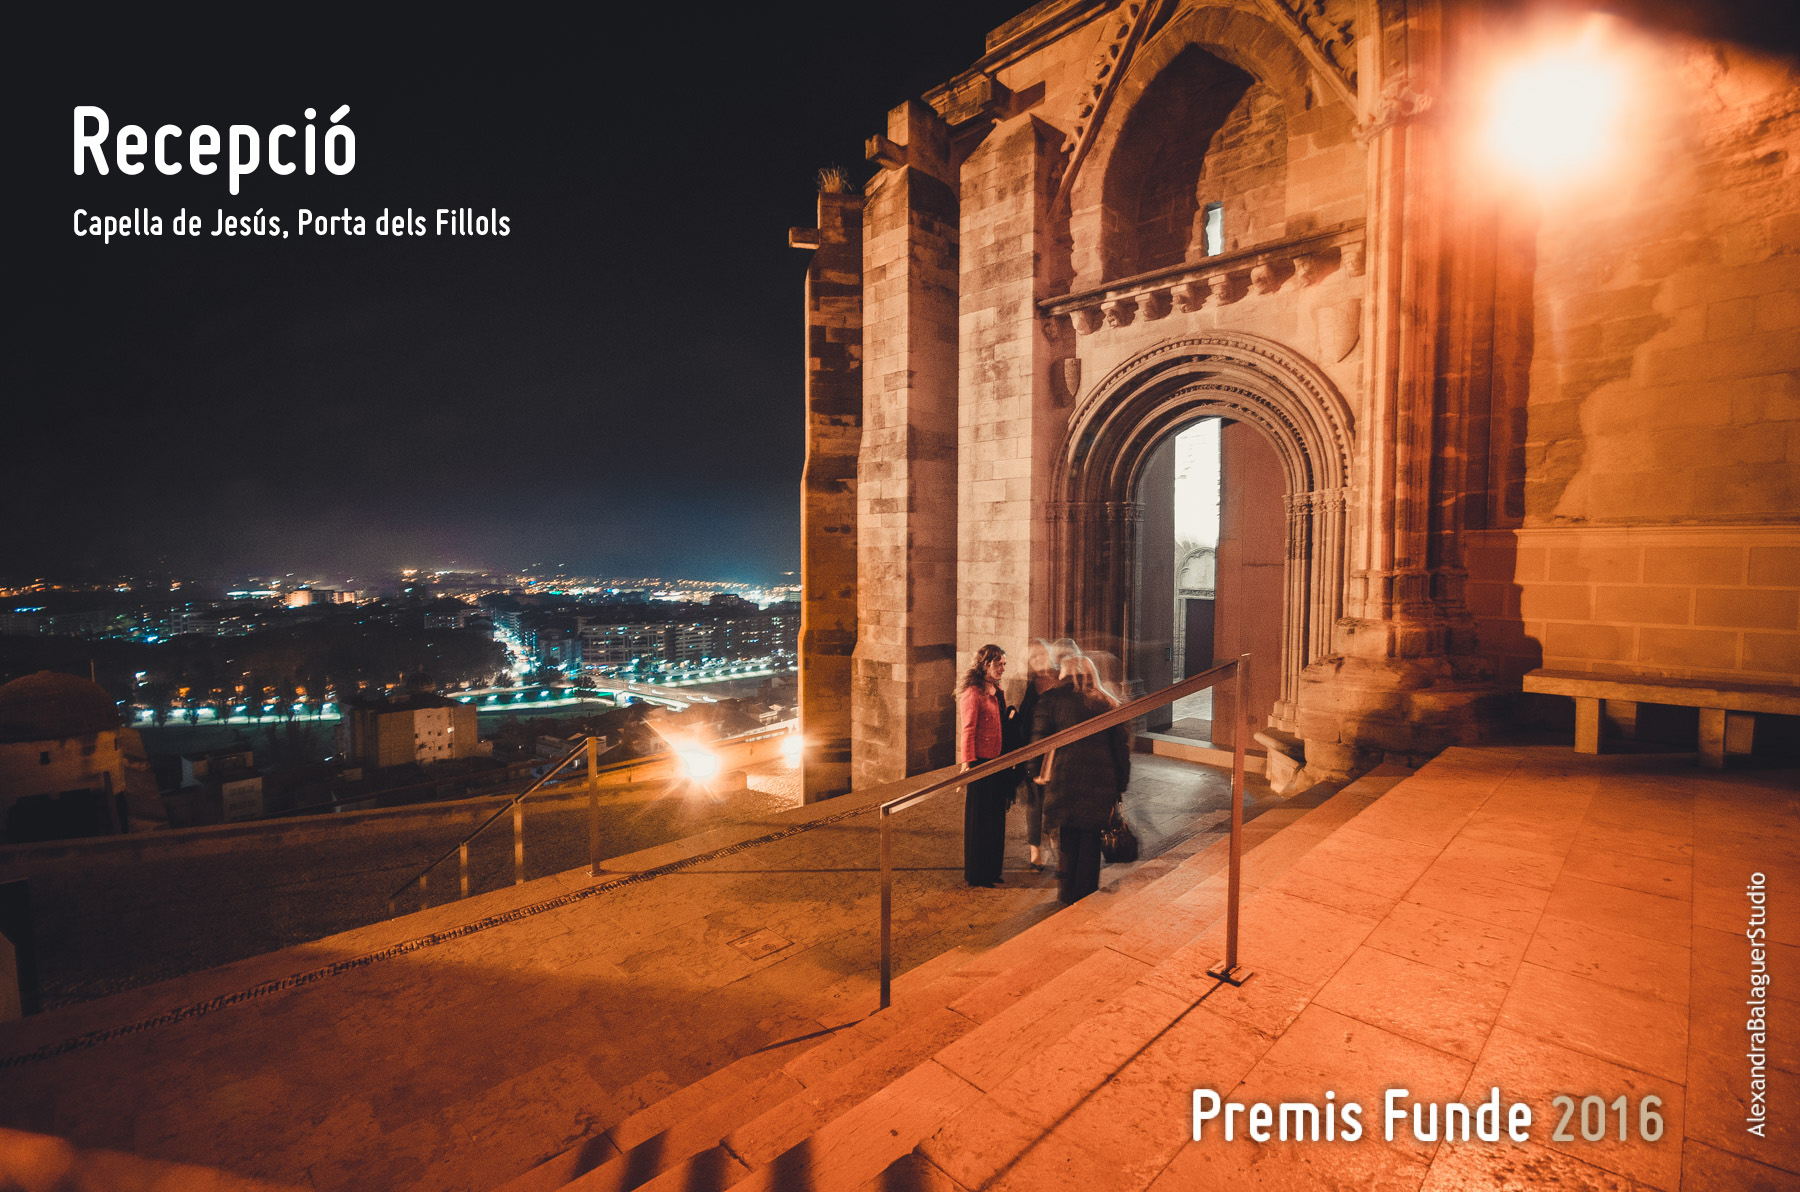 Premios Funde 2015